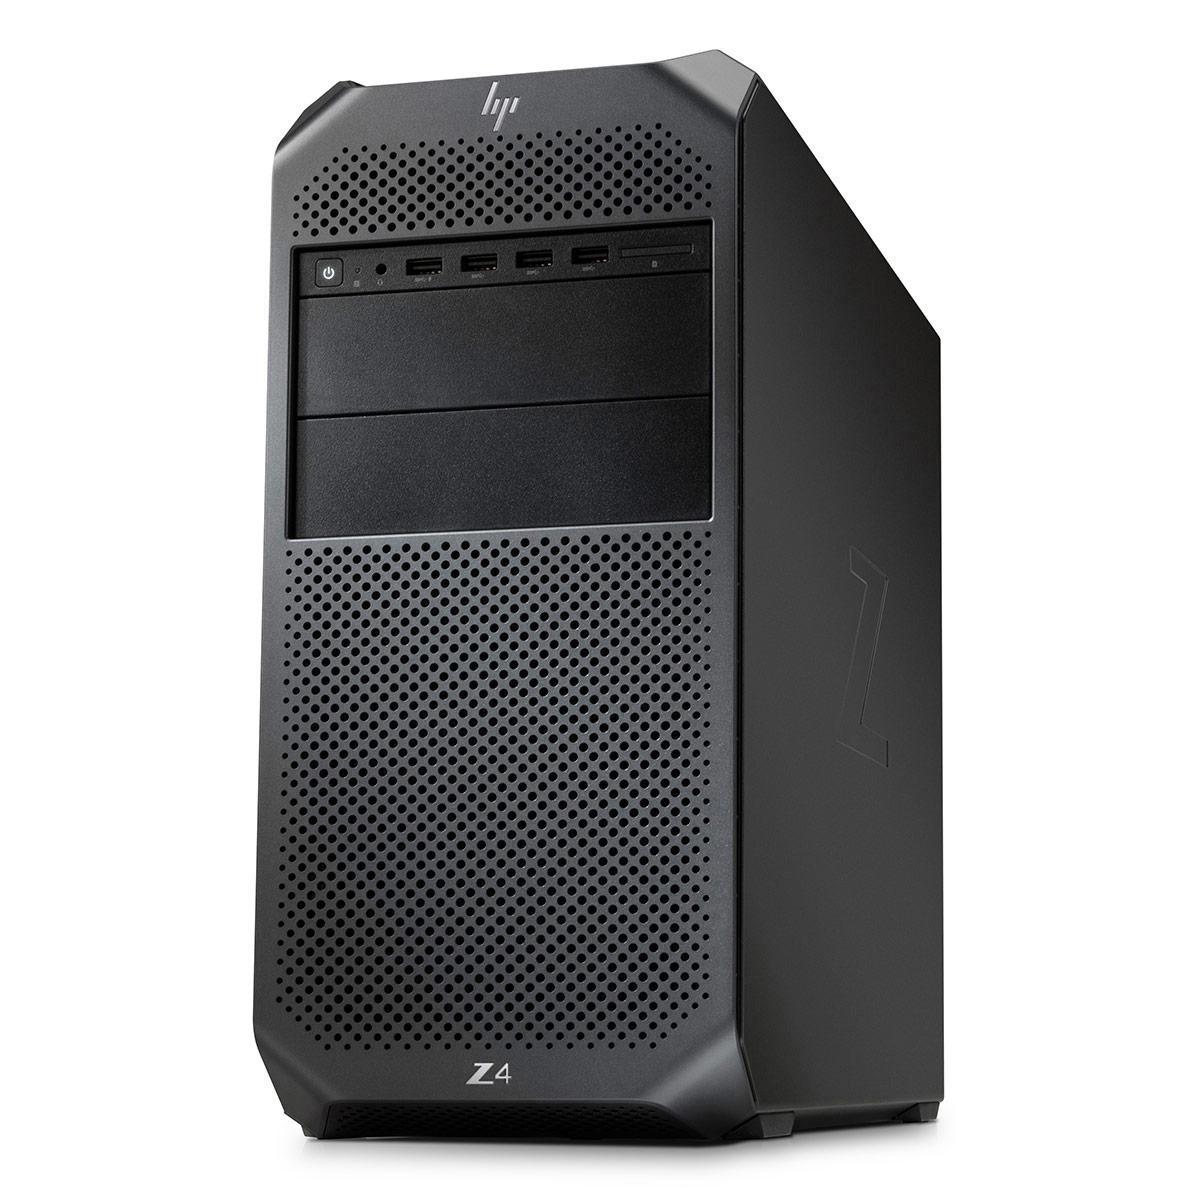 HP Z4 - Intel Core i7-7800X - 32GB - 256GB SSD - Win10Pro - No GFX